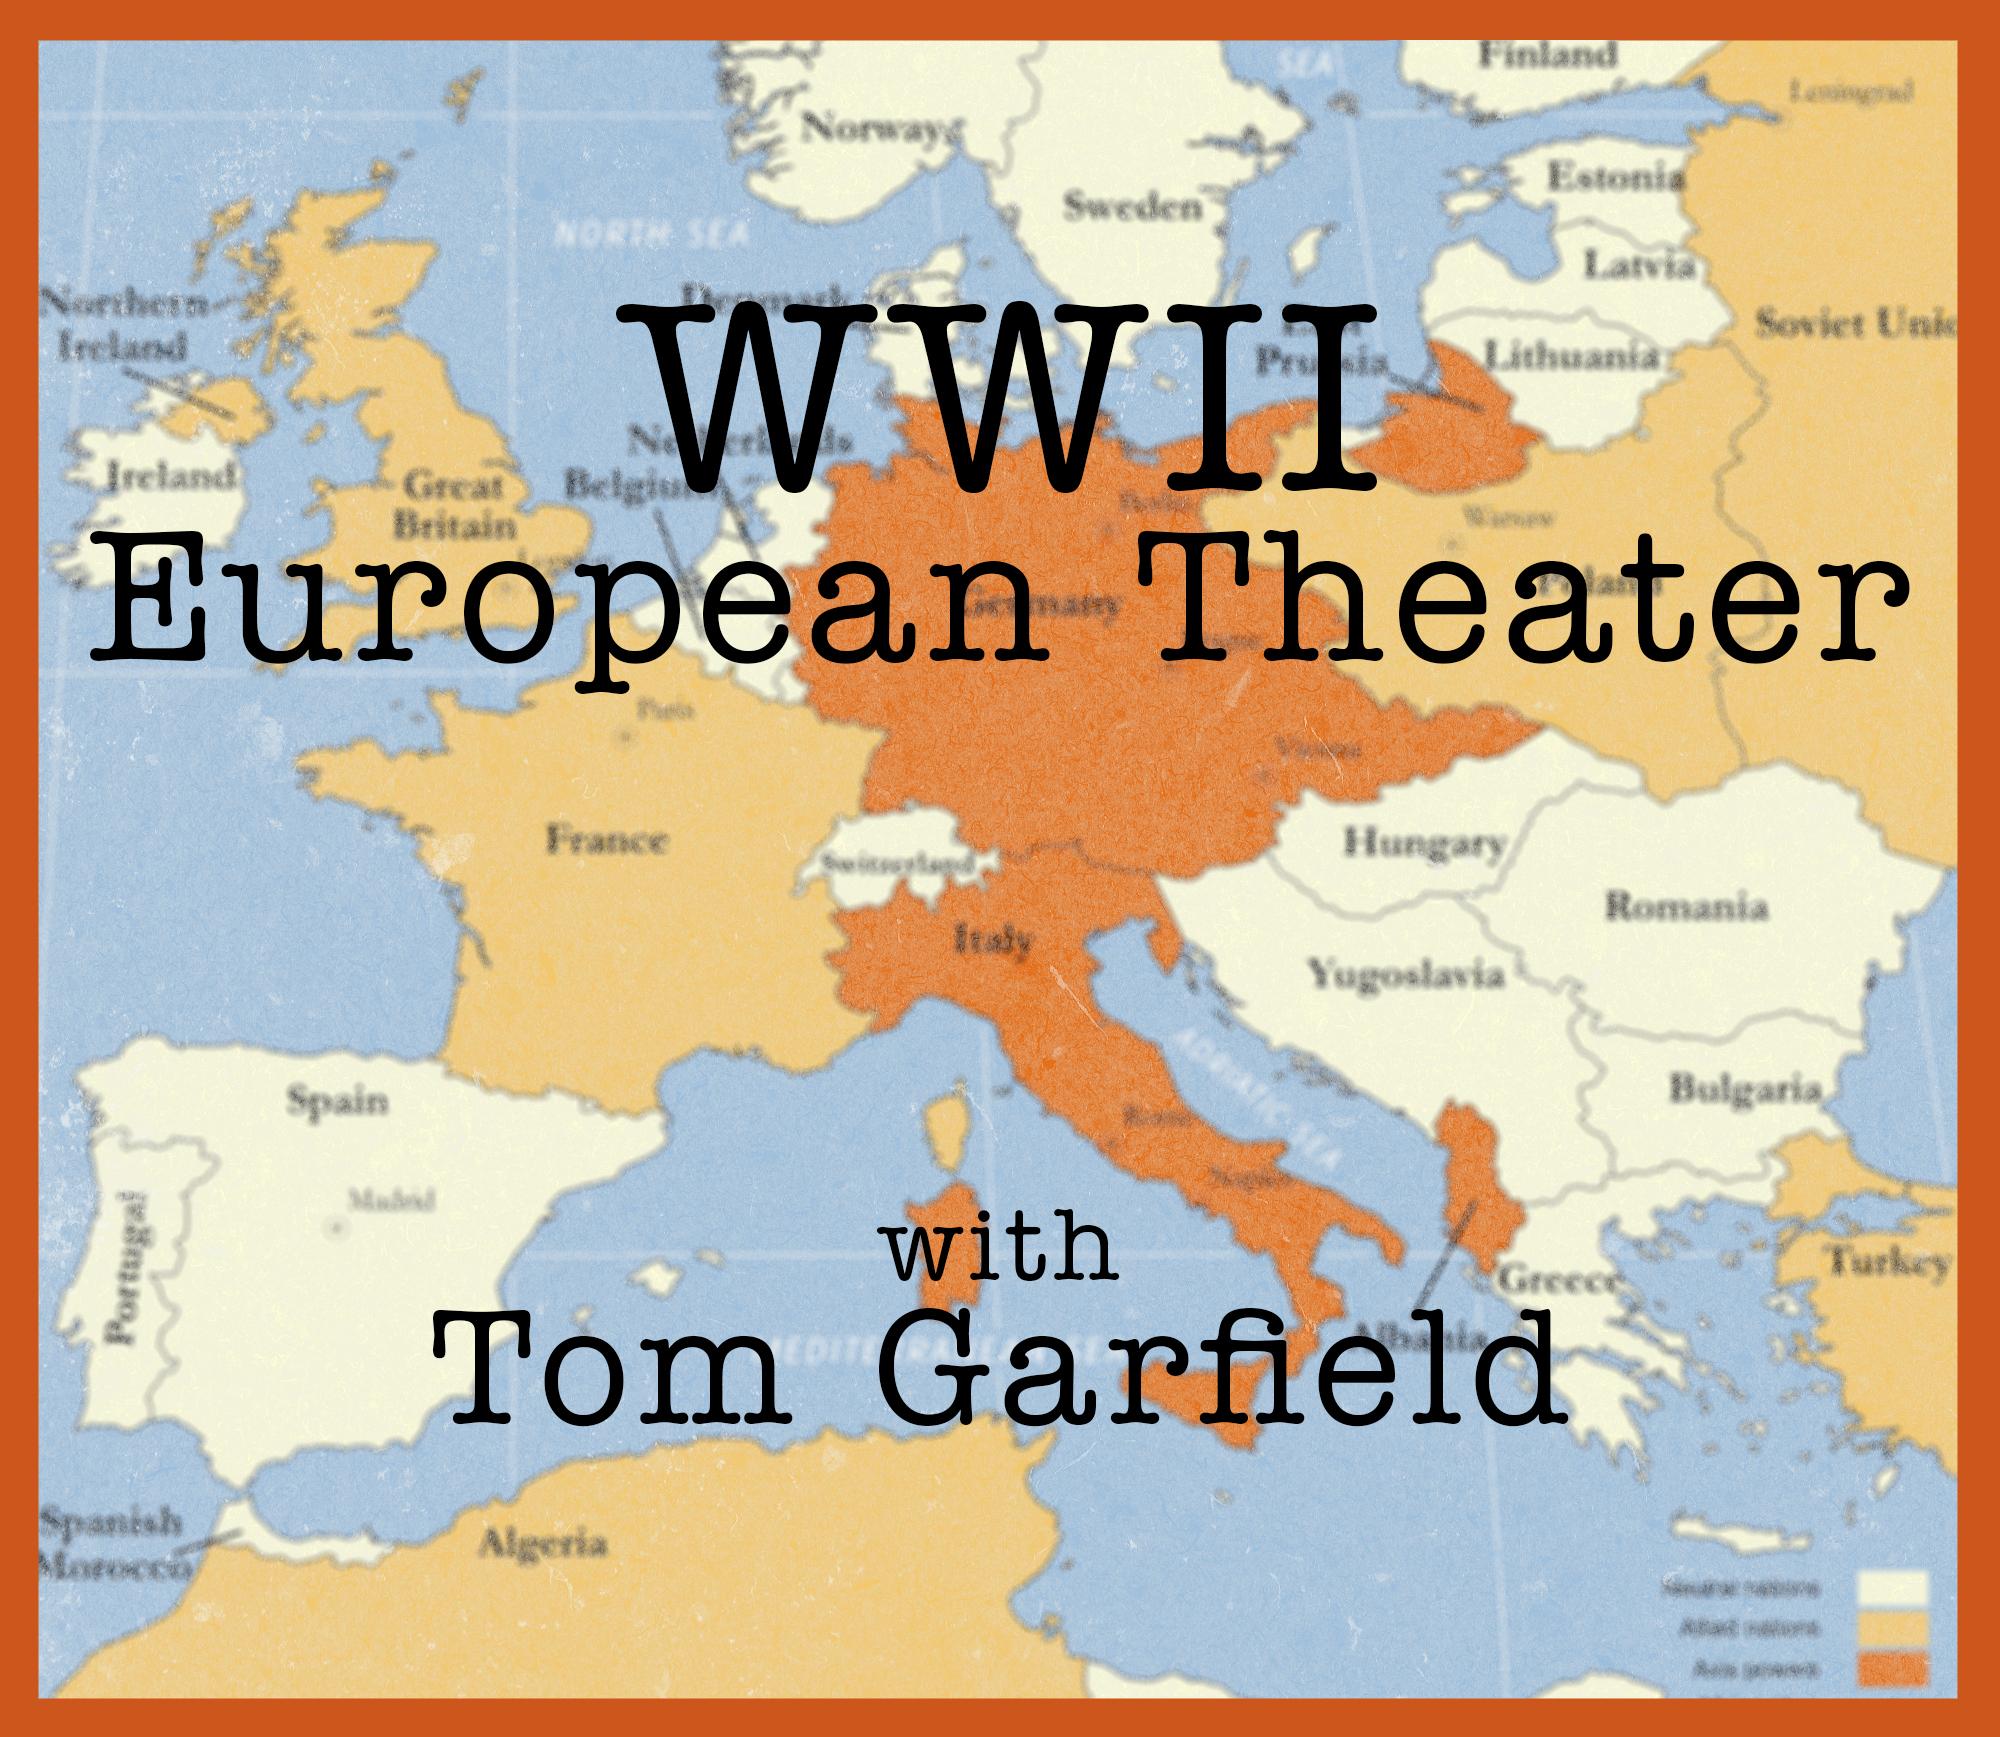 World War II, Part I – The European Theater